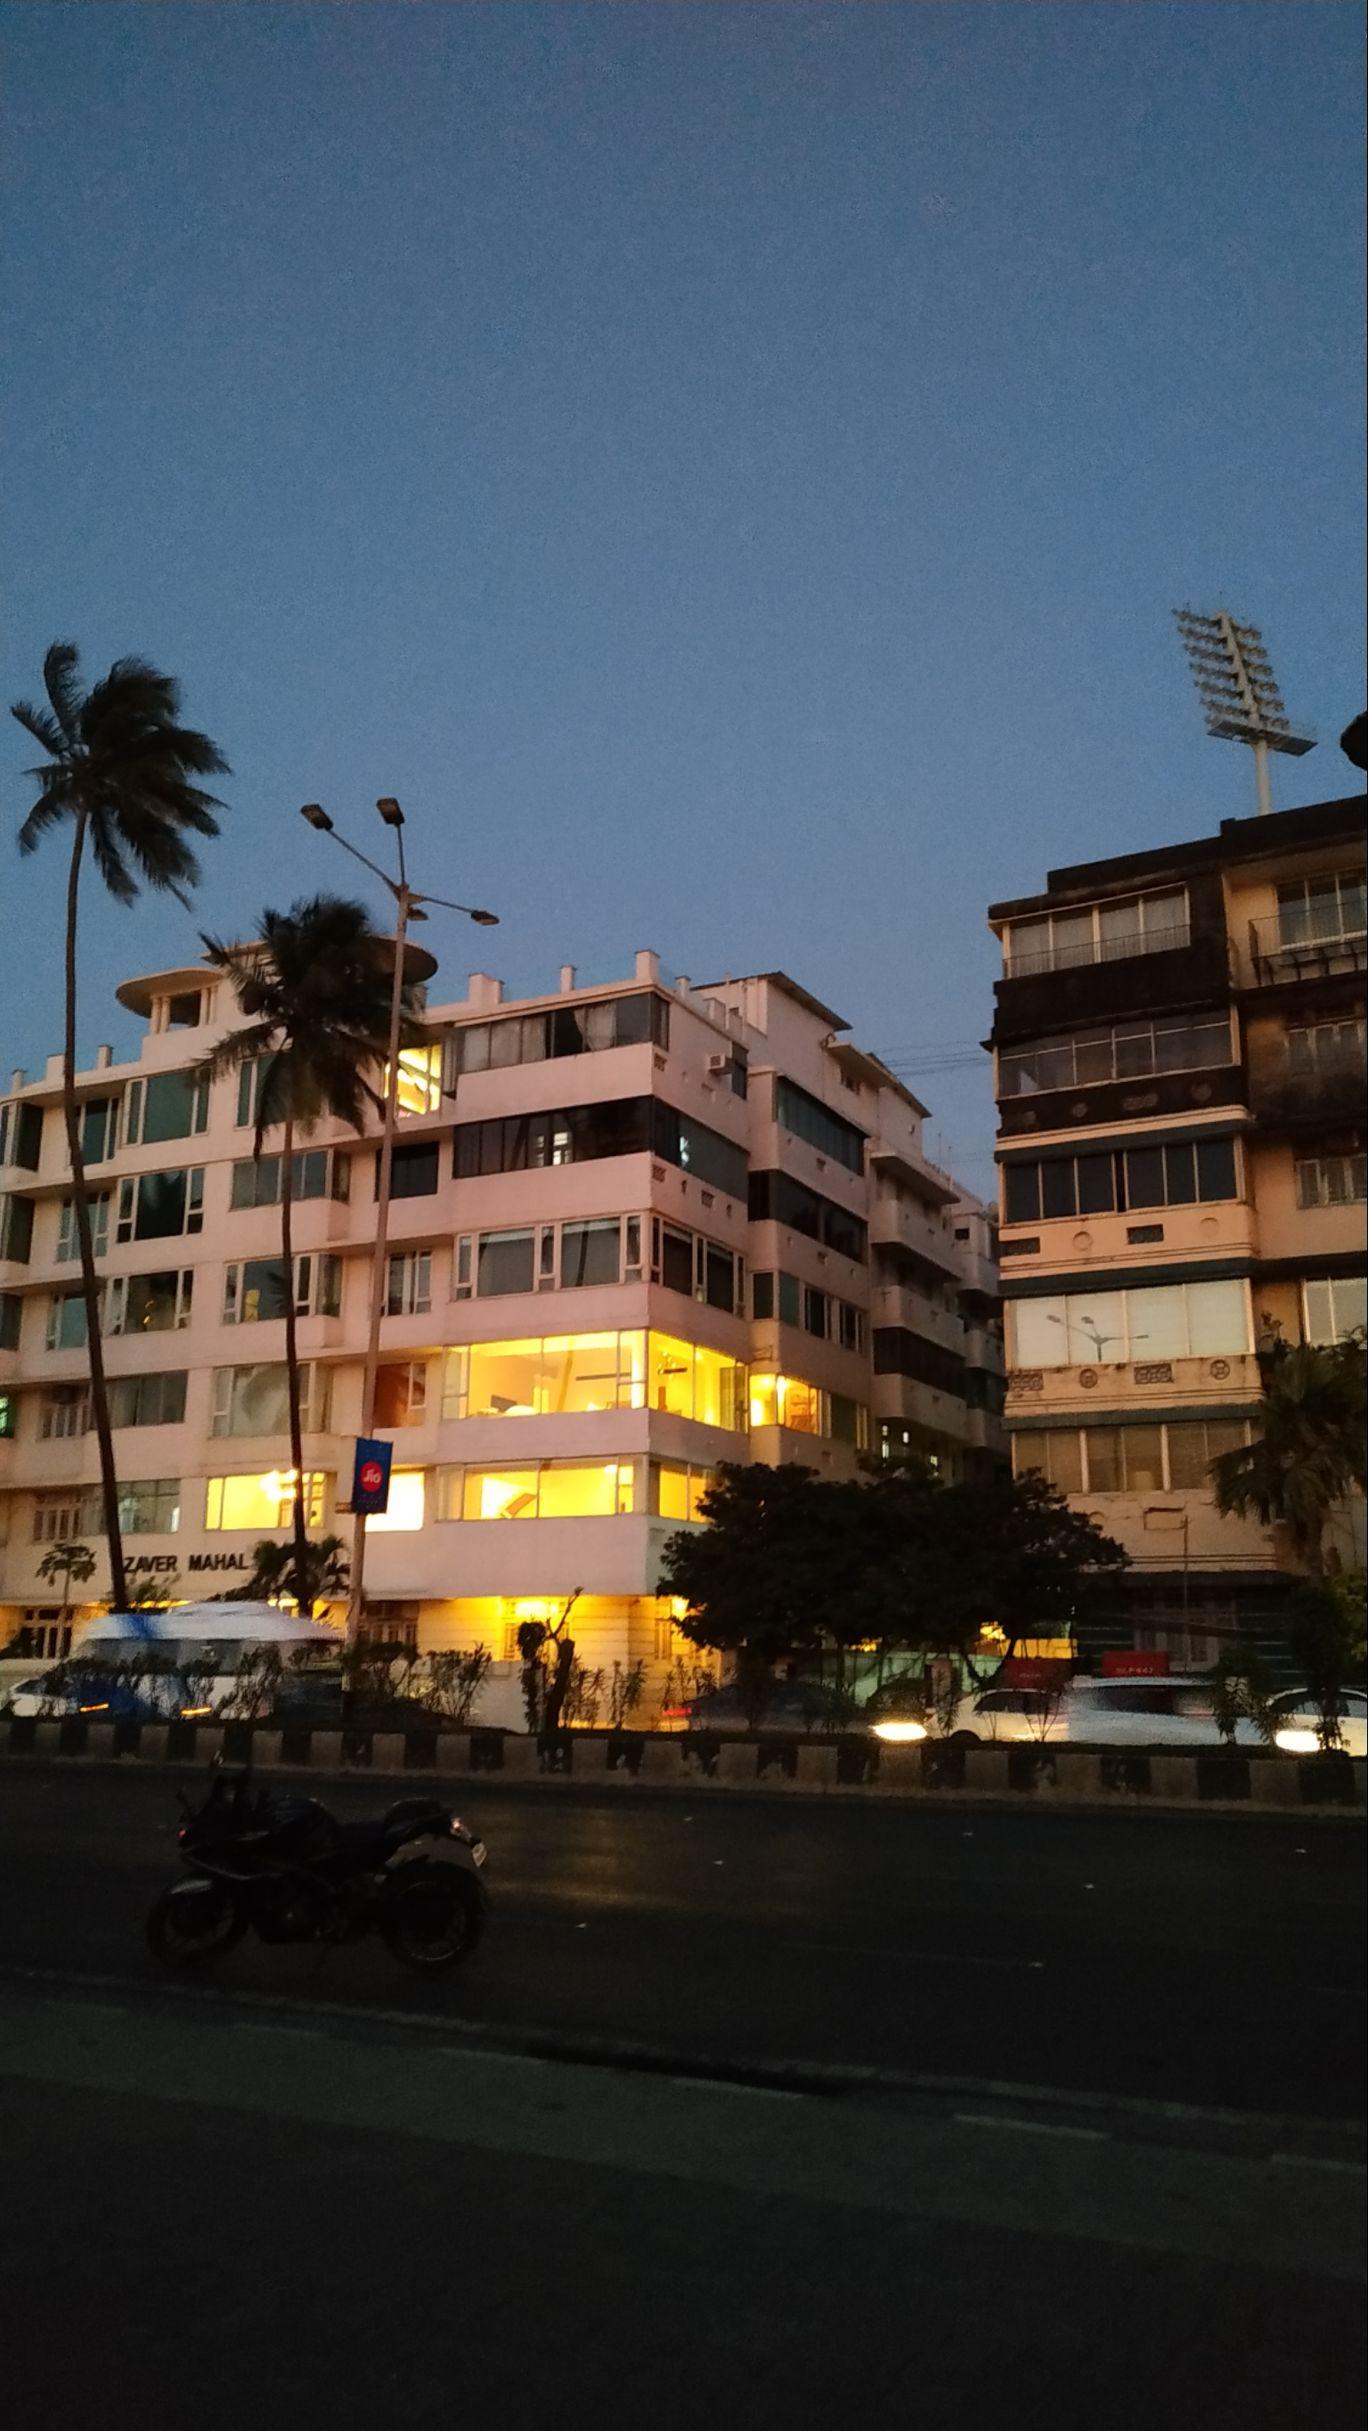 Photo of Marine Drive By Neeraj Shukla